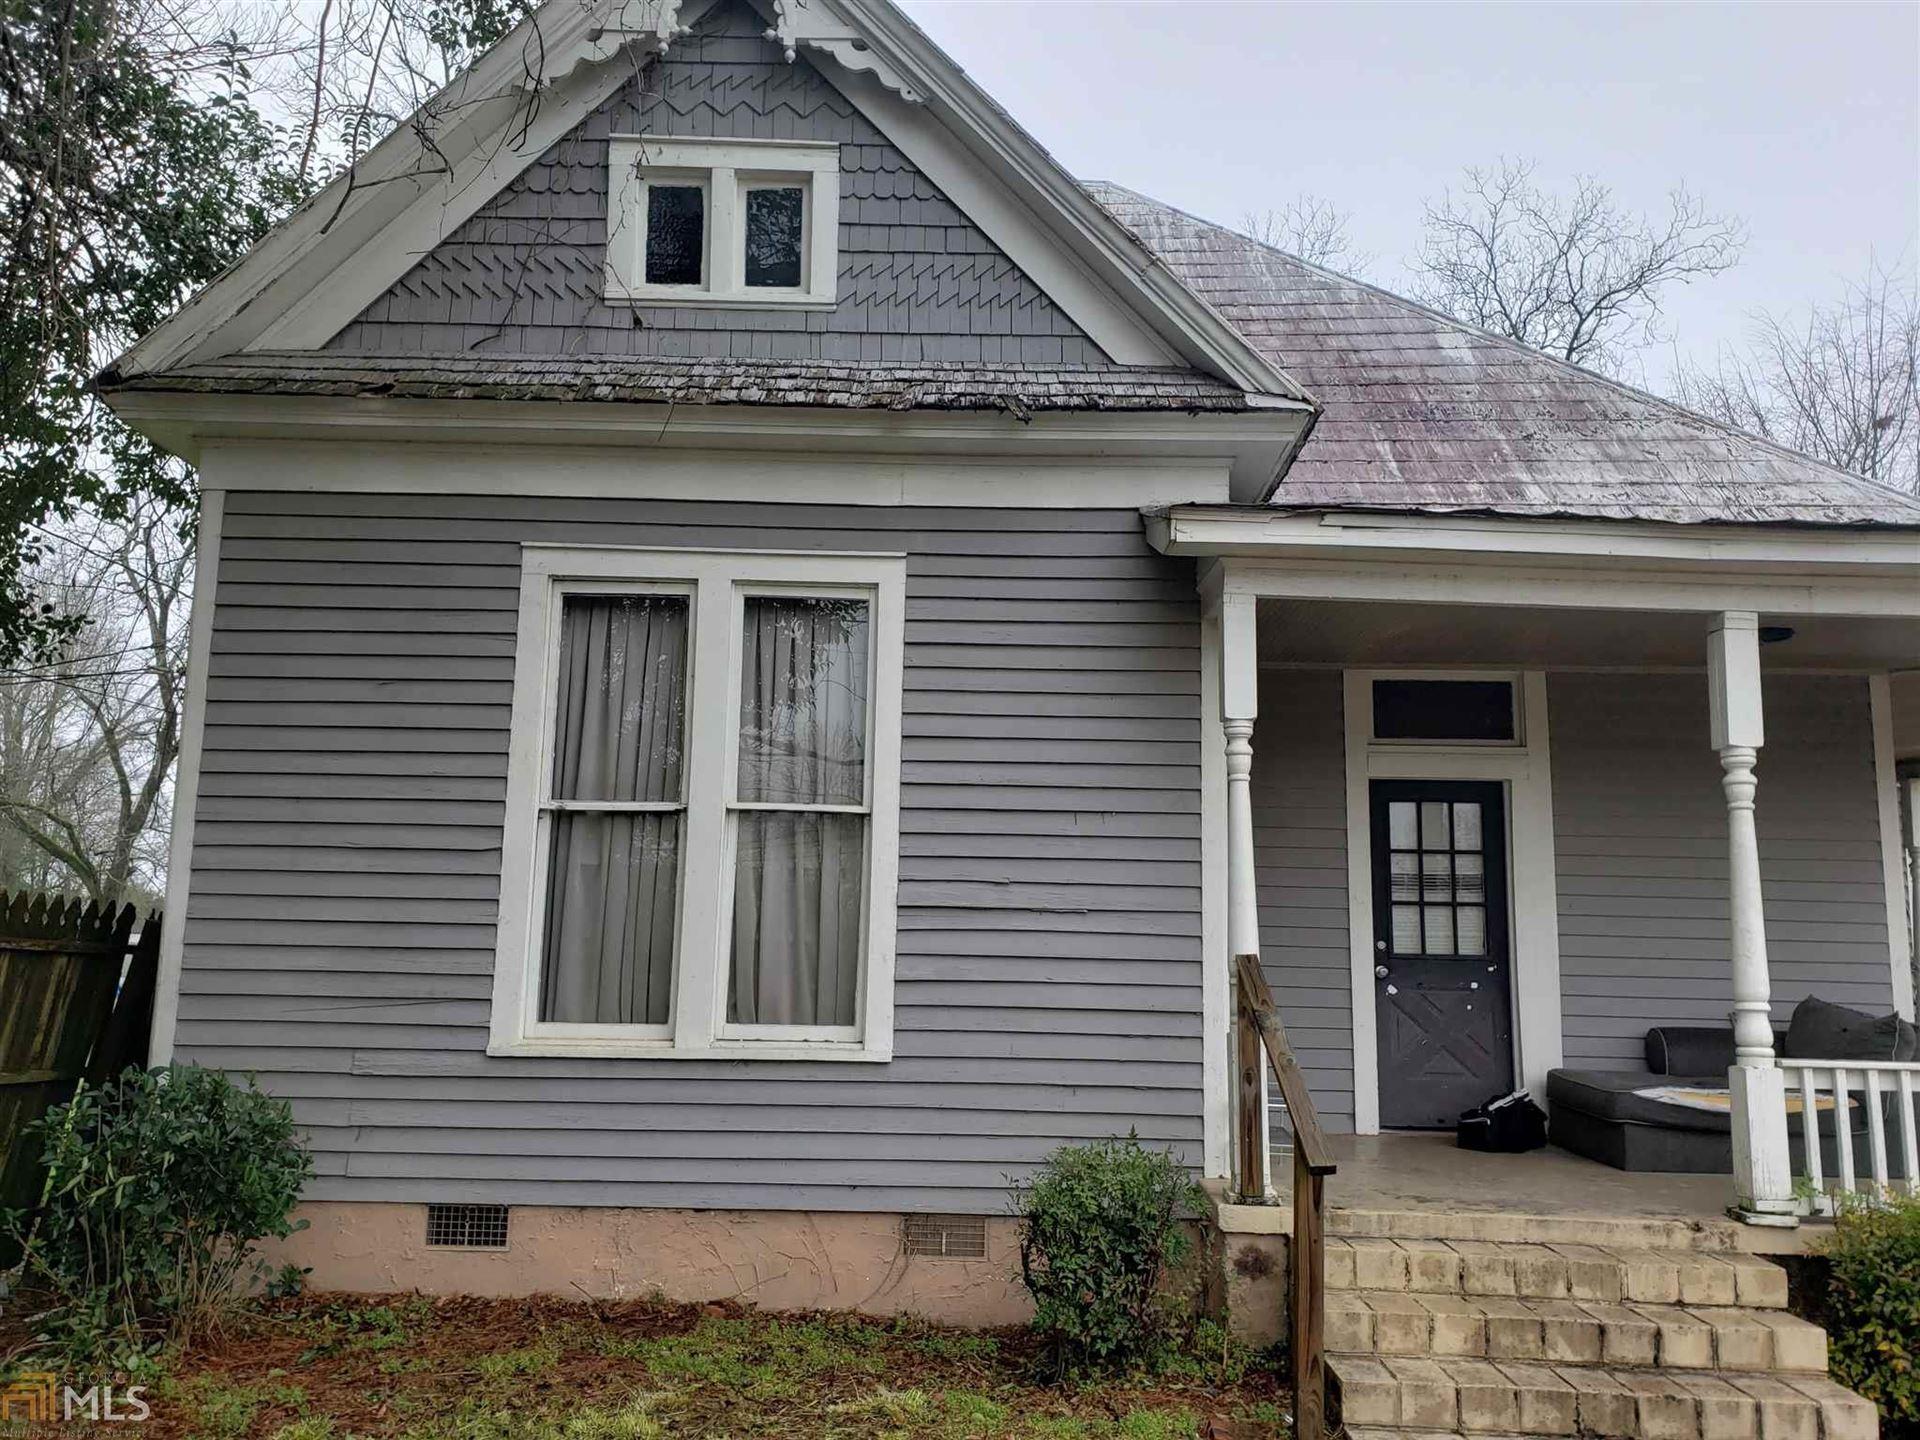 342 Forsyth, Barnesville, GA 30204 - #: 8922997